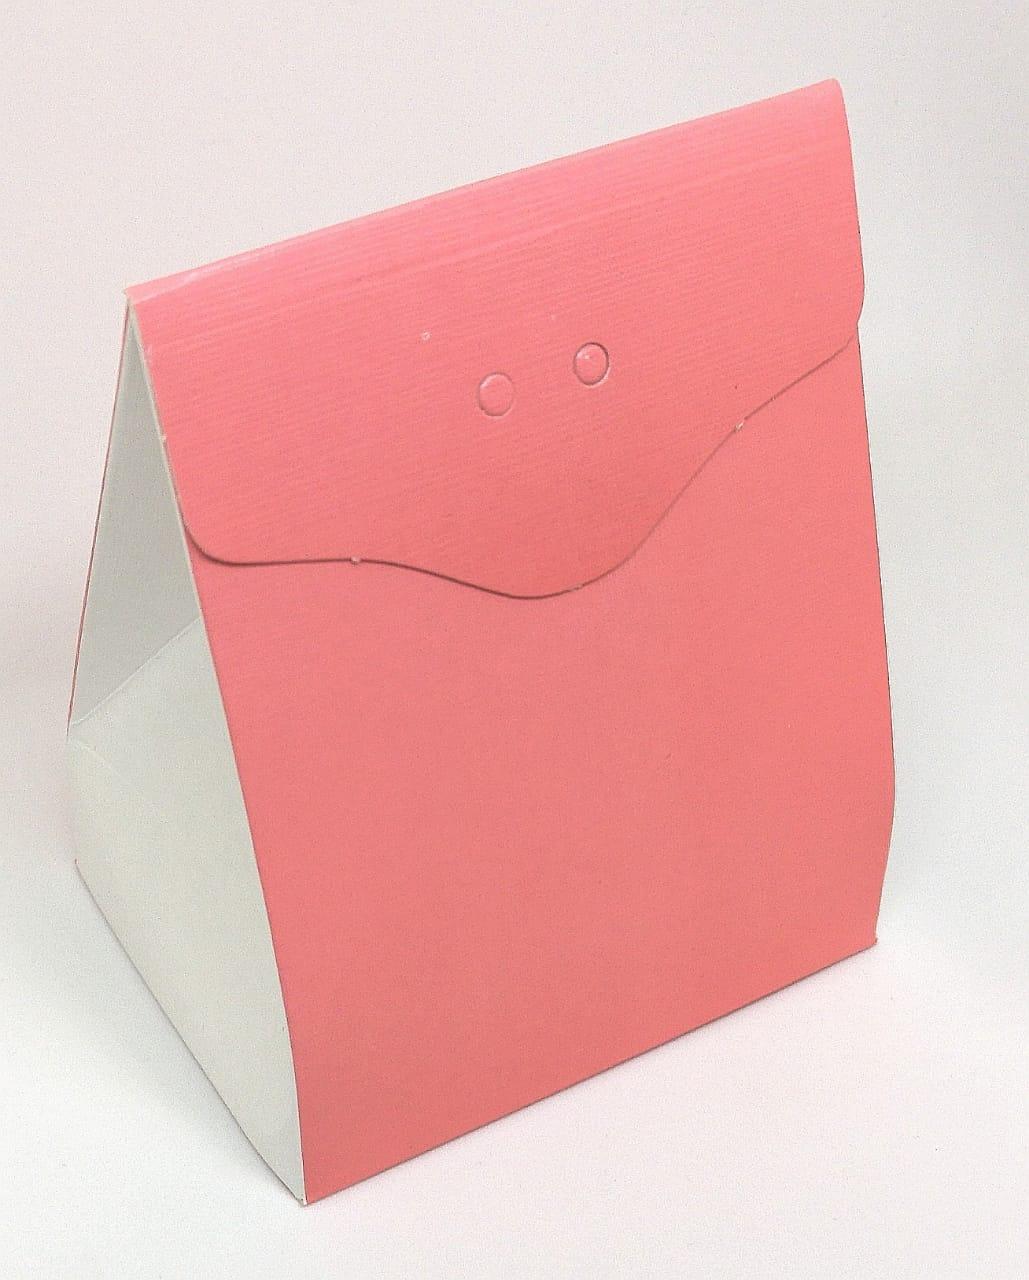 Caixa para presente 9,5 x 12 cm - c/ 10 unidades